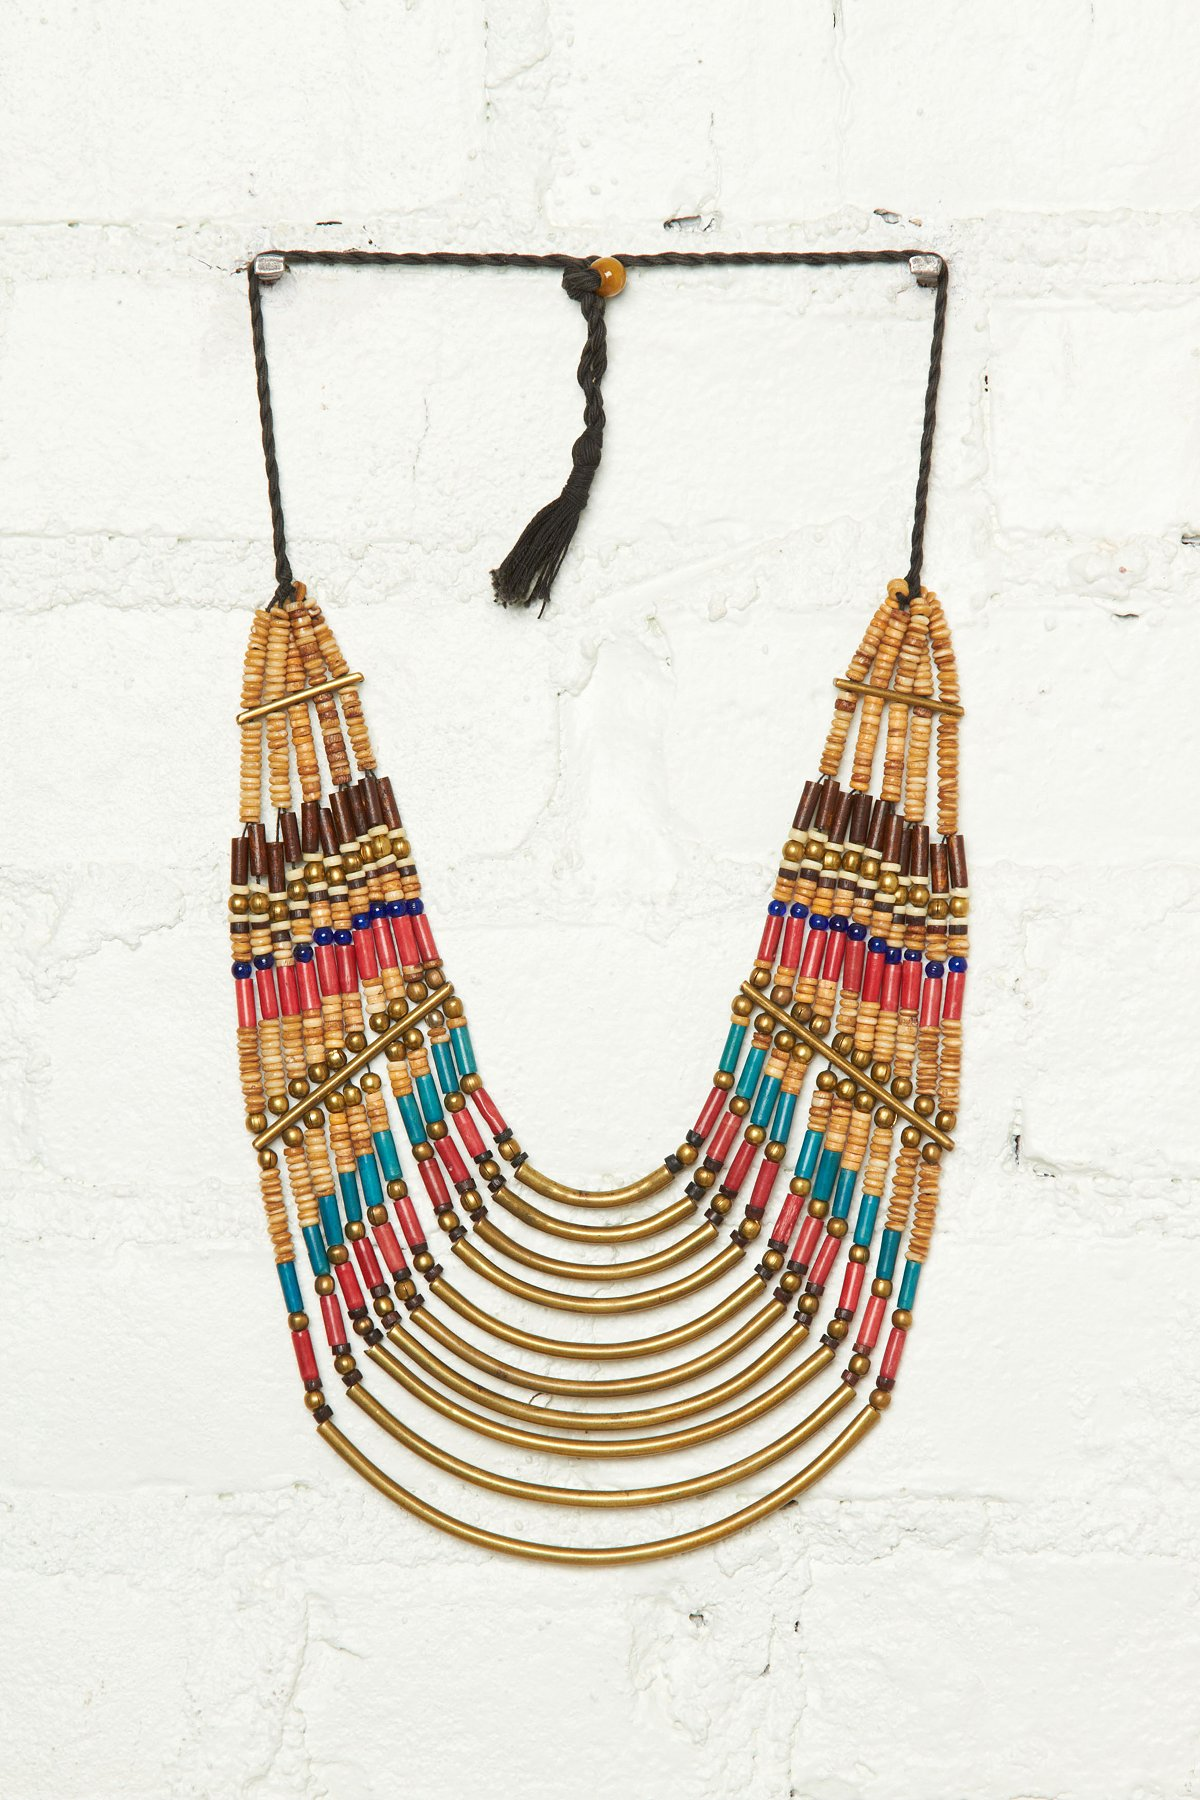 Vintage Stone & Metal Necklace